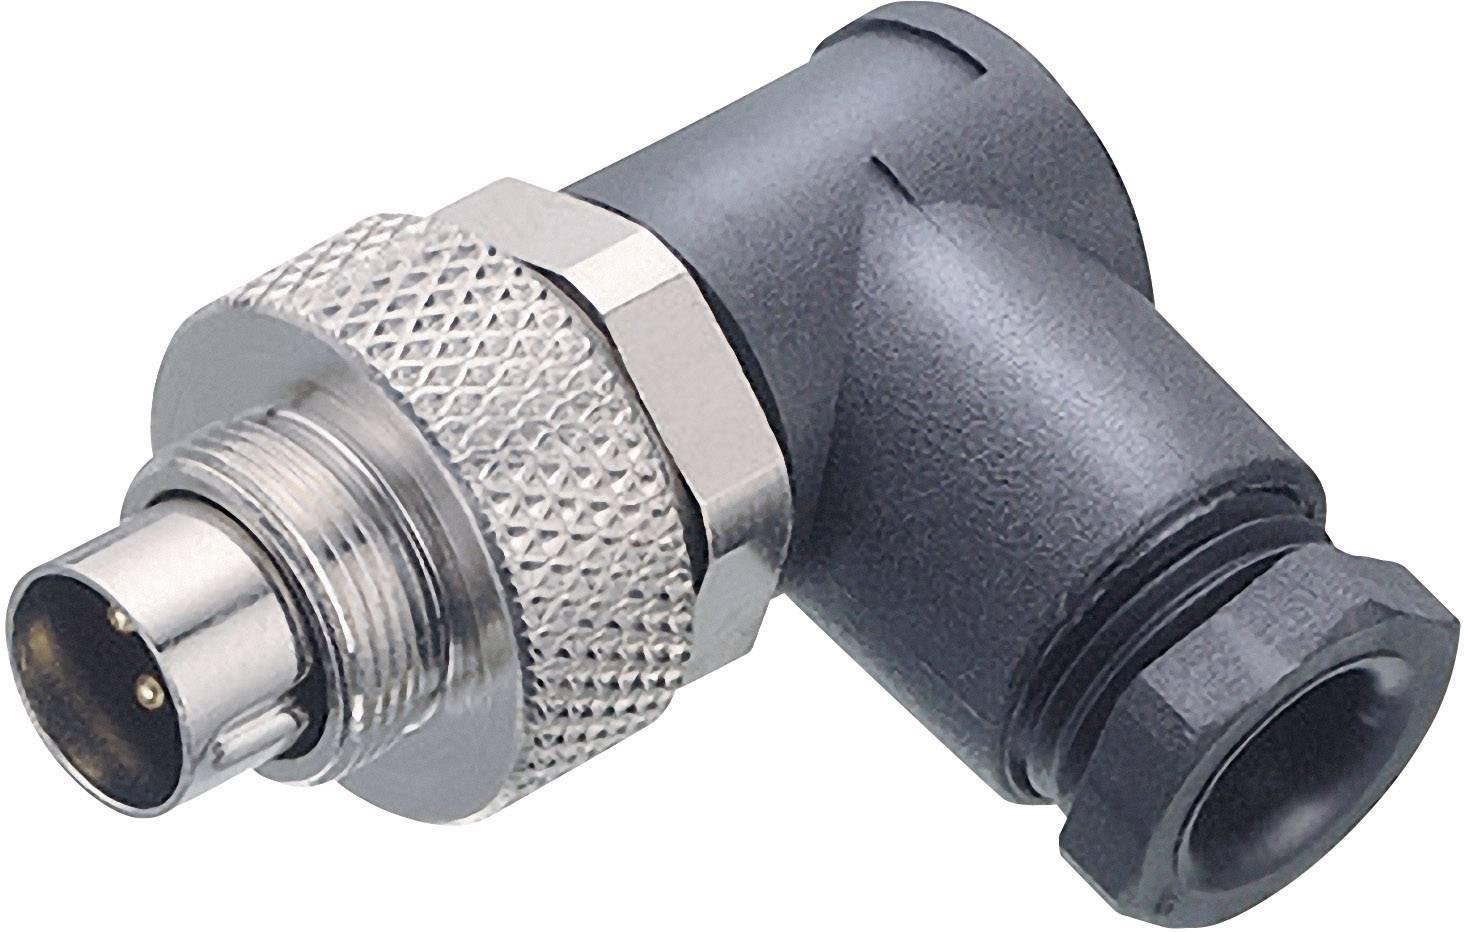 Guľatý konektor submin. Binder 99-0405-70-03, 3-pól., uhlová zástrčka, 3,5 - 5 mm, IP67